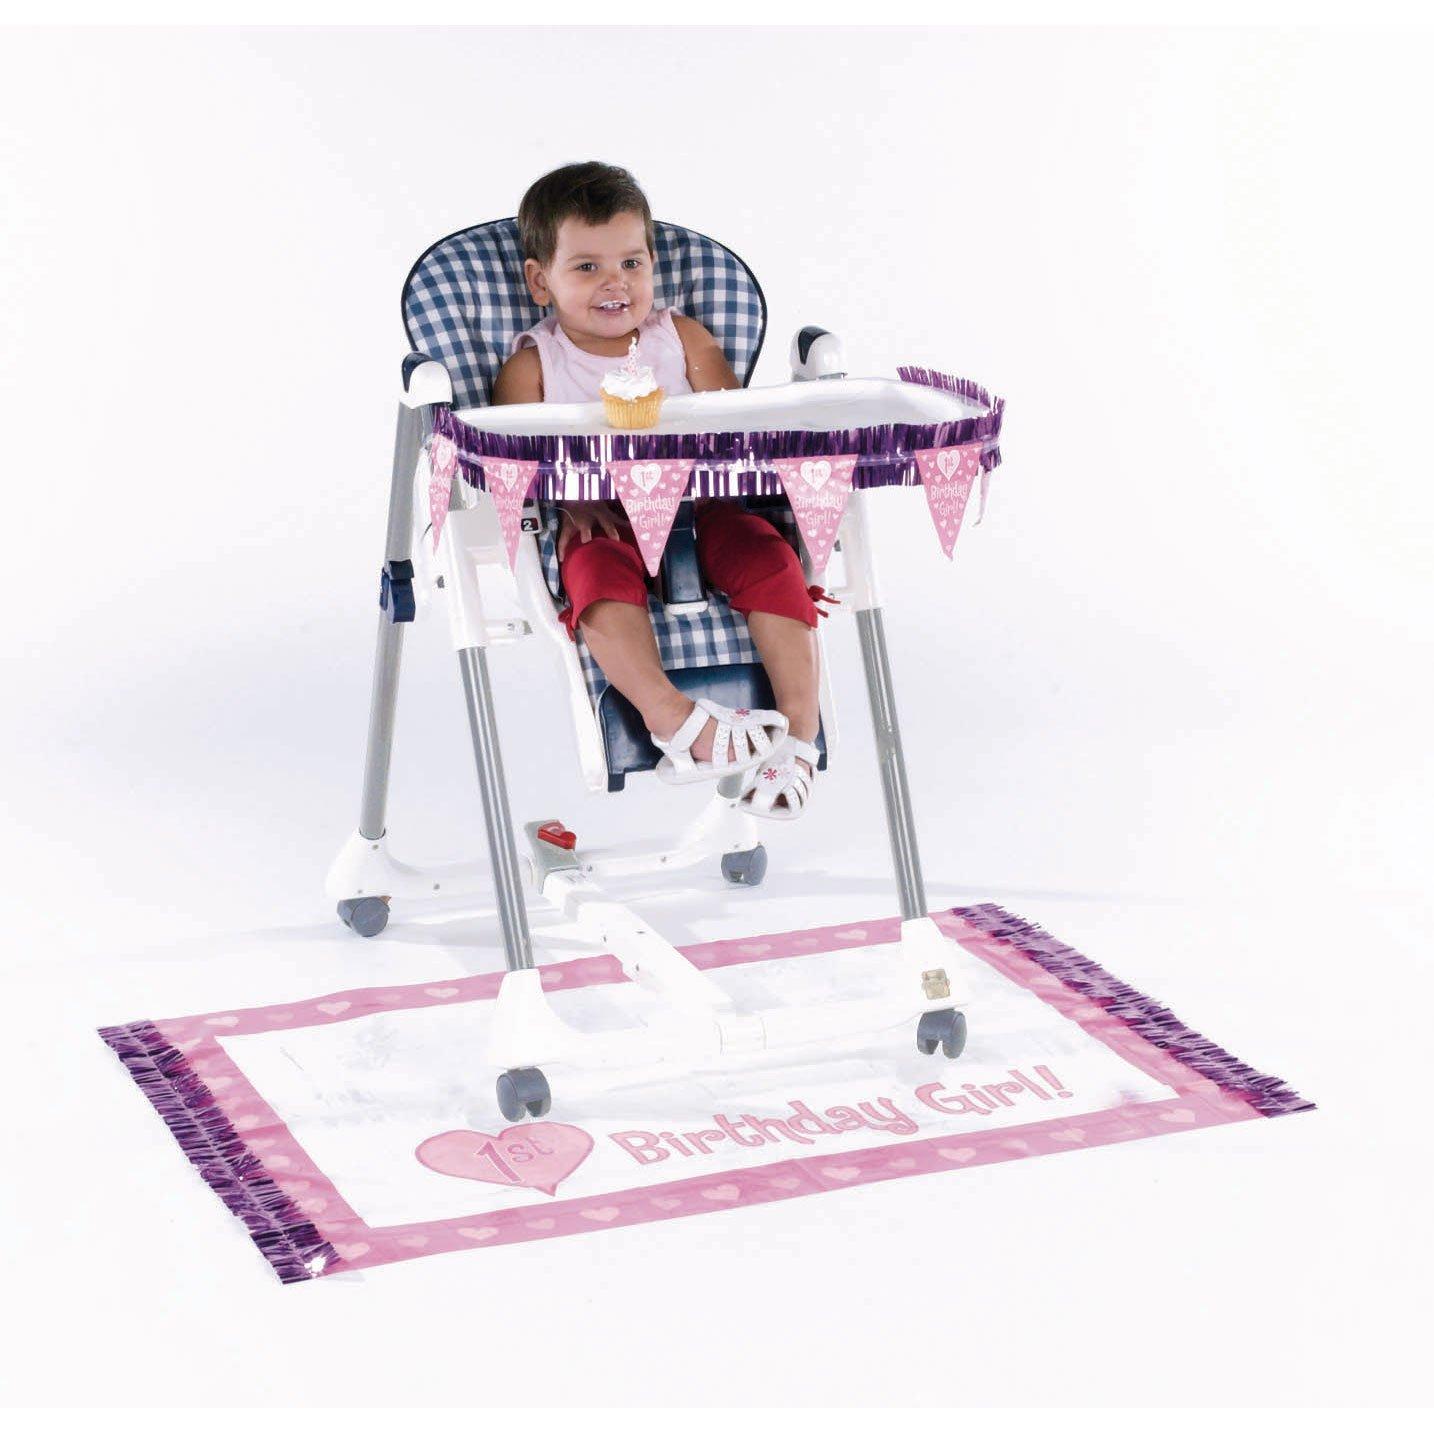 Amazon.com: Baby Girlu0027s First Birthday High Chair Decorating Kit, 2pc: Toys  U0026 Games